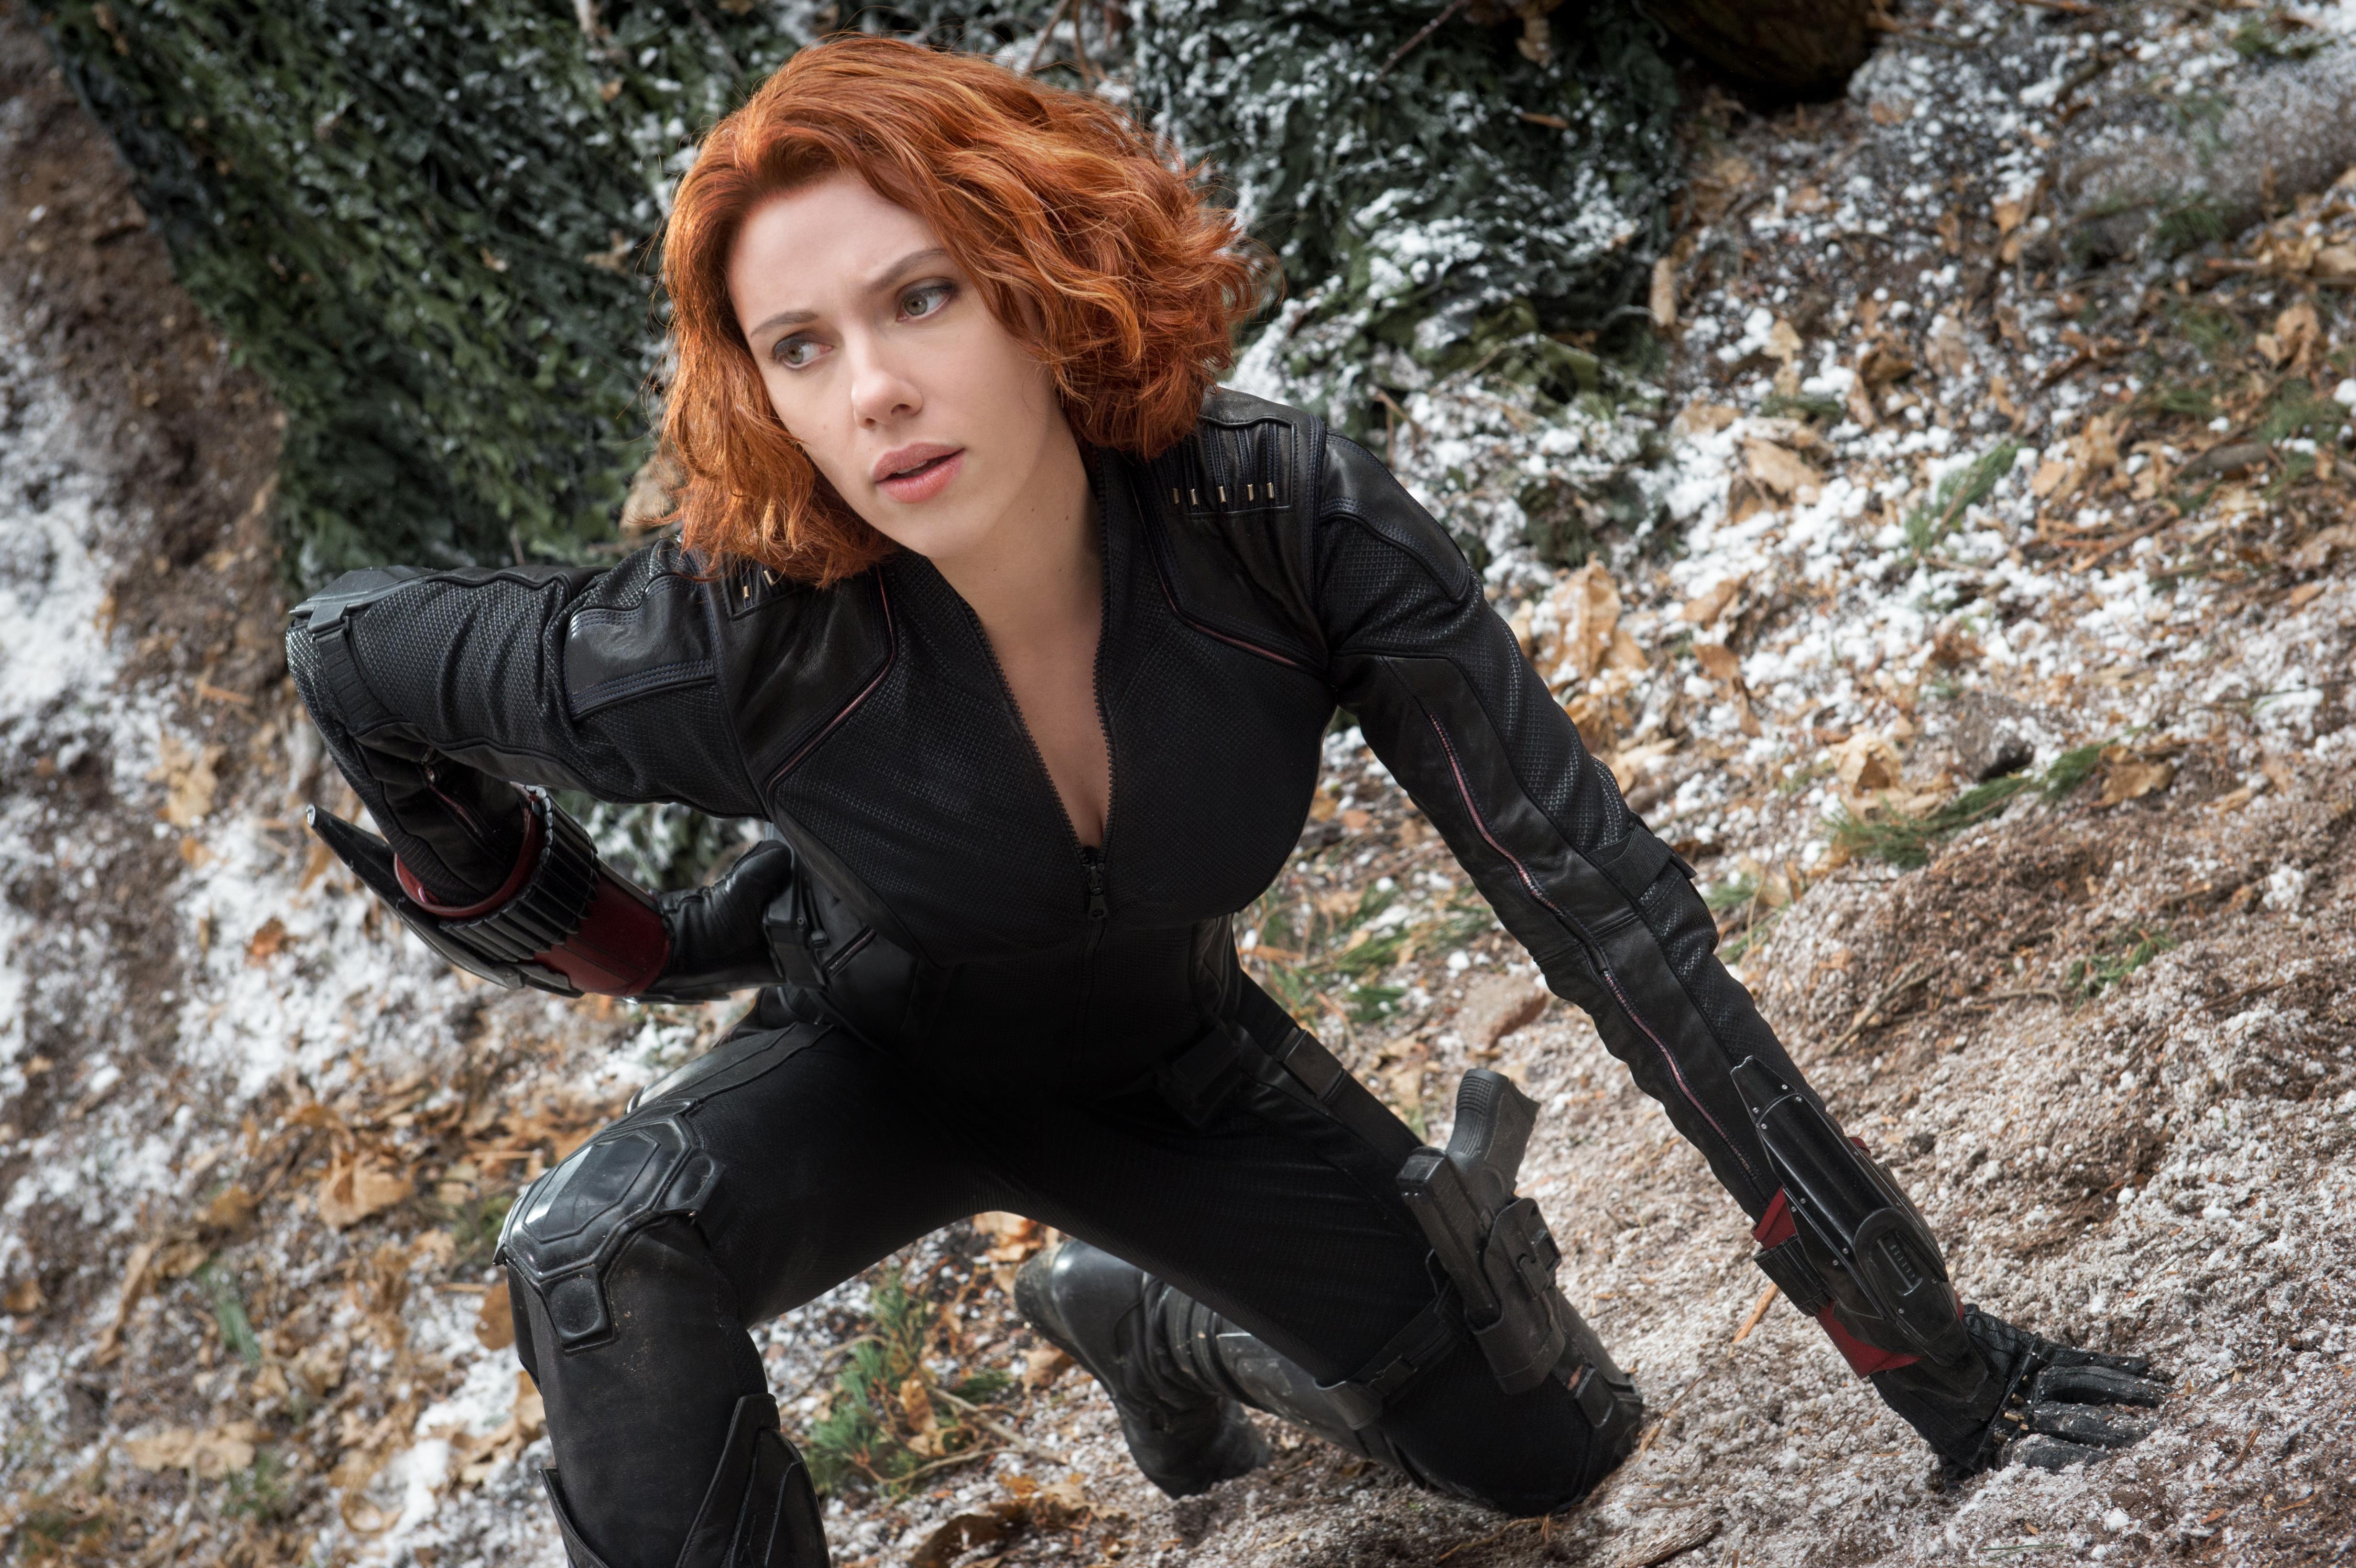 Black Widow: The Budapest reveal doesn't make sense